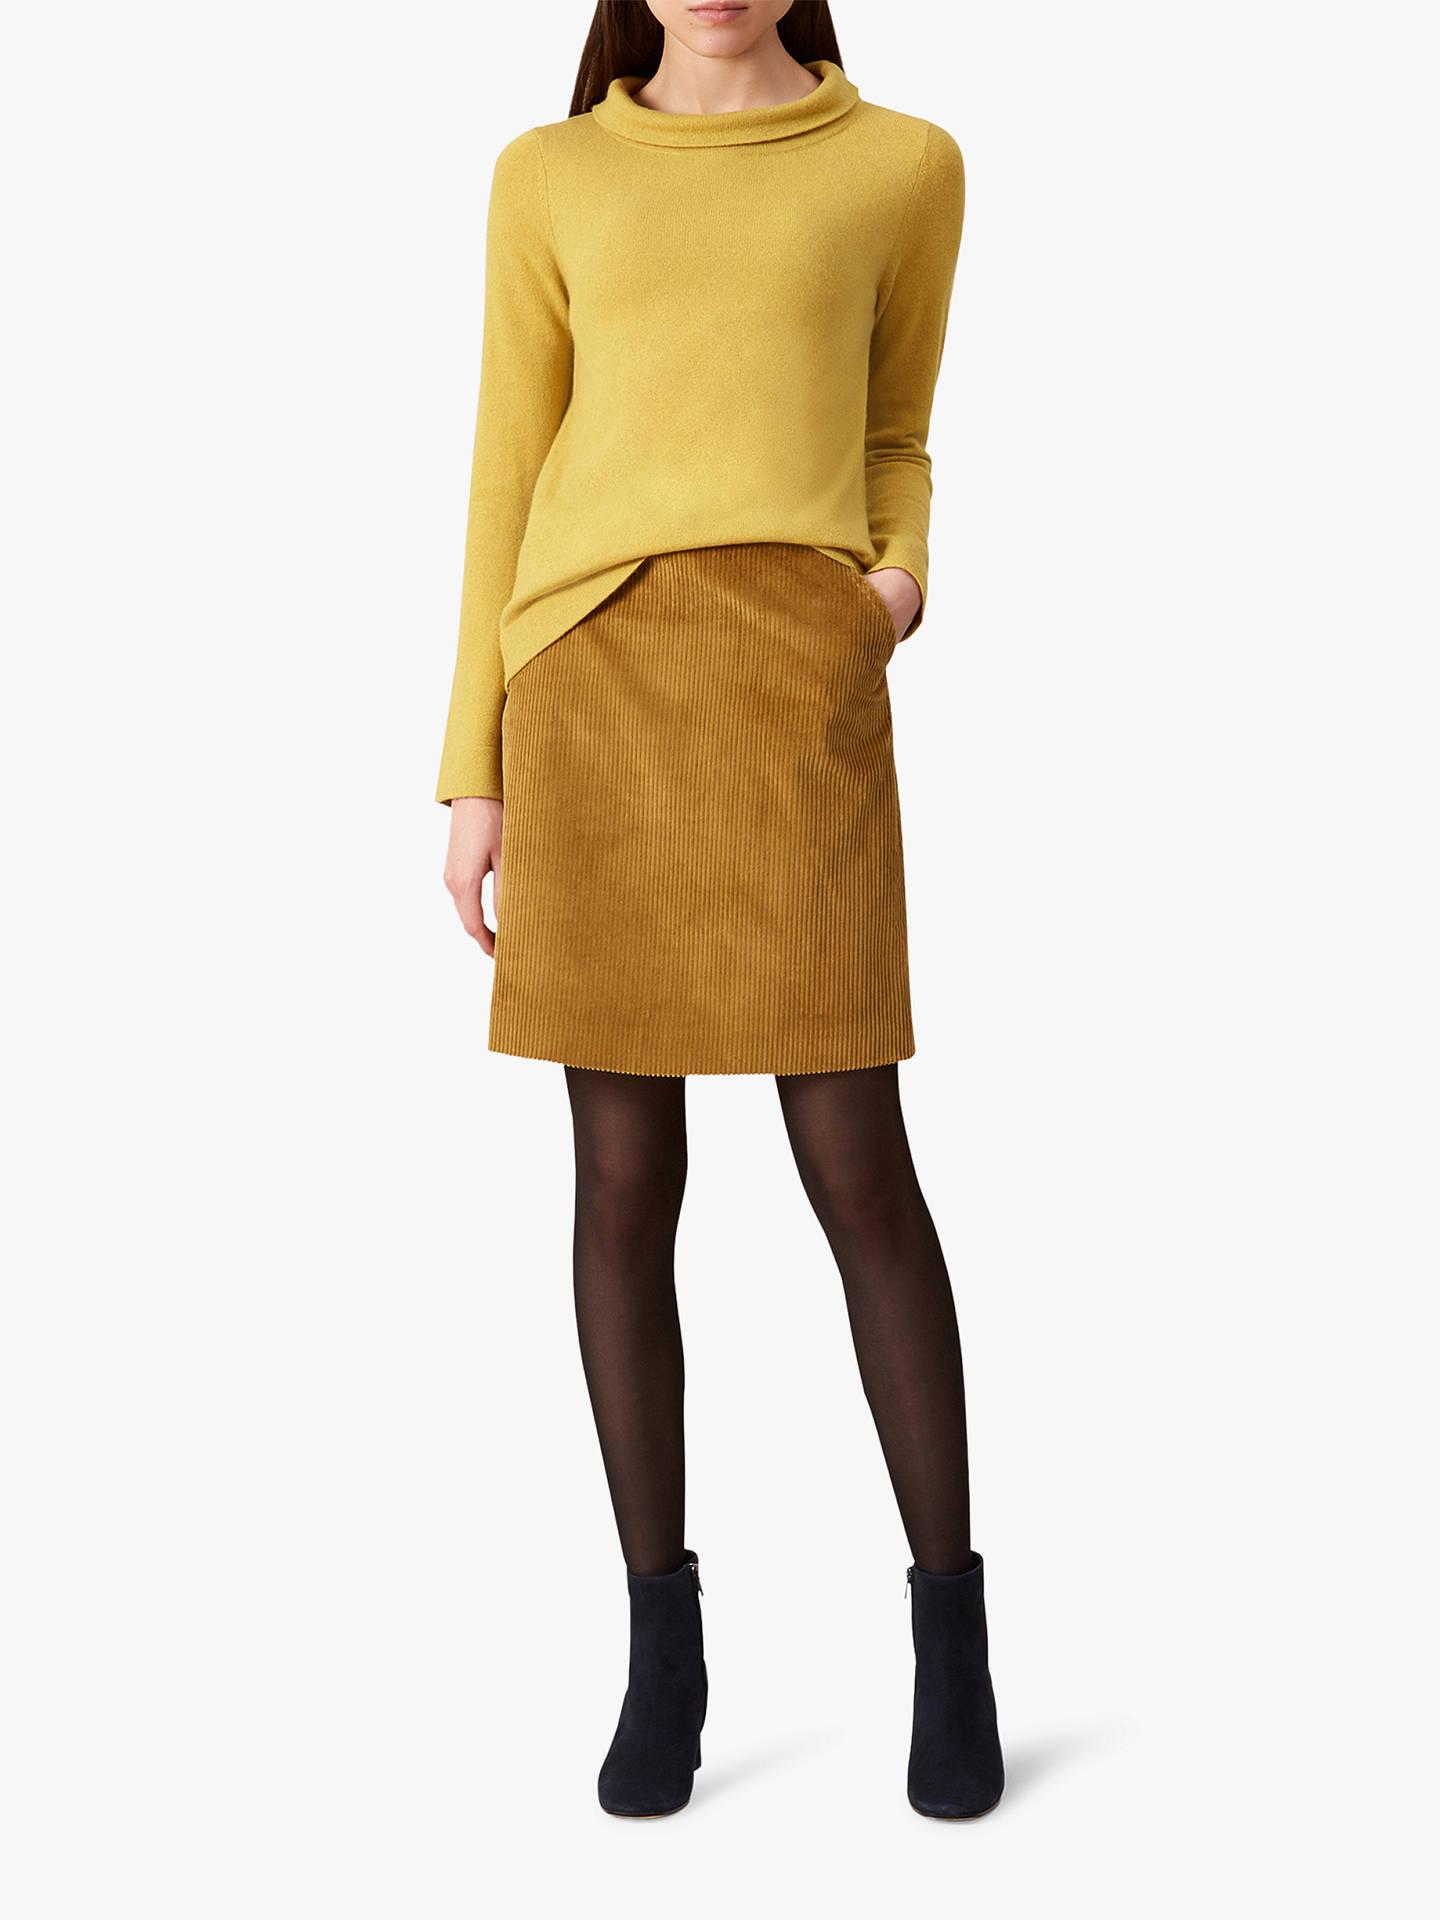 0dbd5482252b67 Buy Hobbs Hannah Cord Skirt, Mustard, 12 Online at johnlewis.com ...